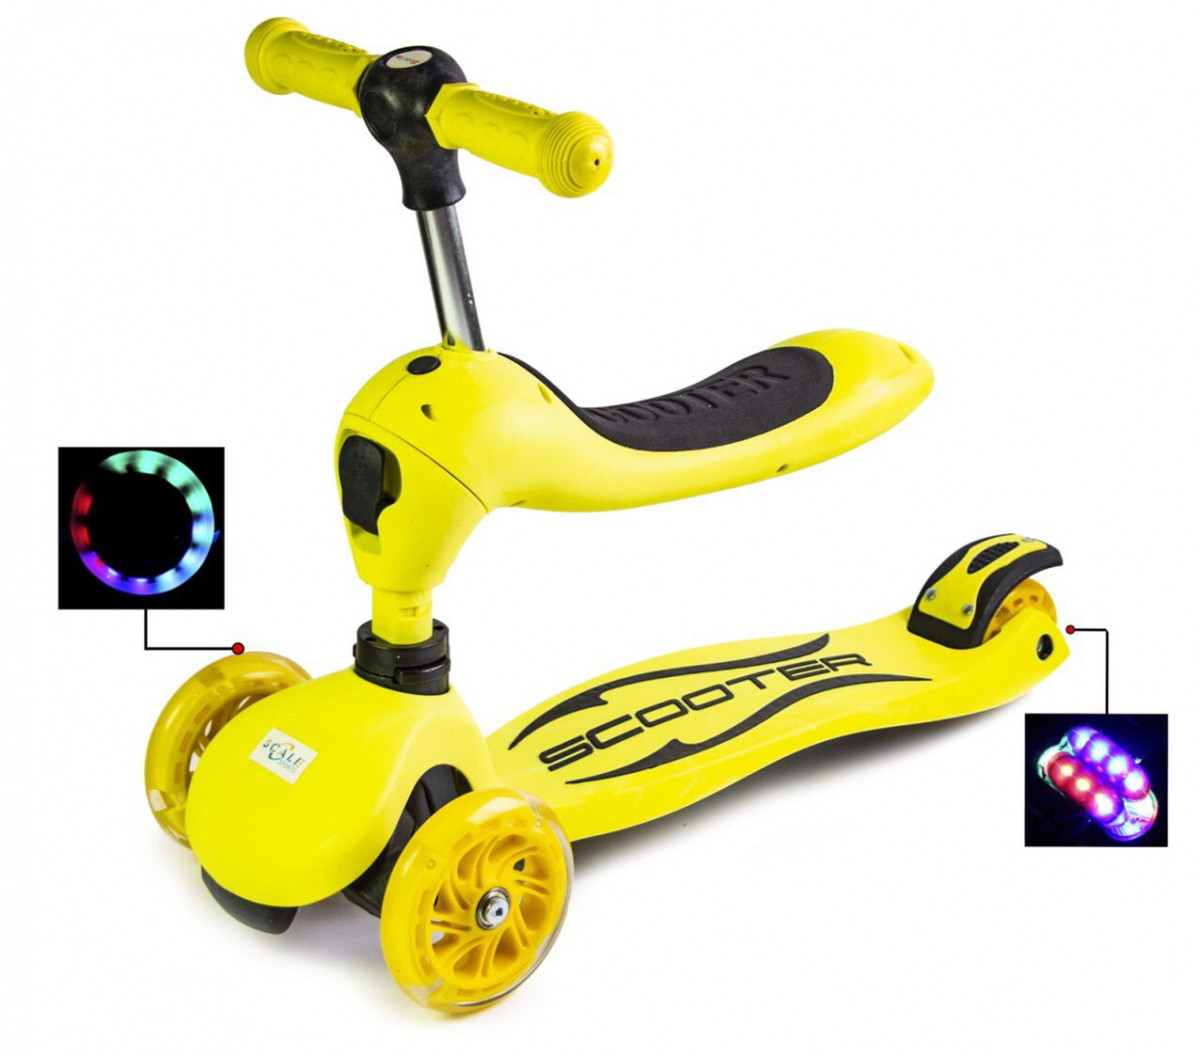 Самокат-трансформер Scale Sports 2in1 желтый